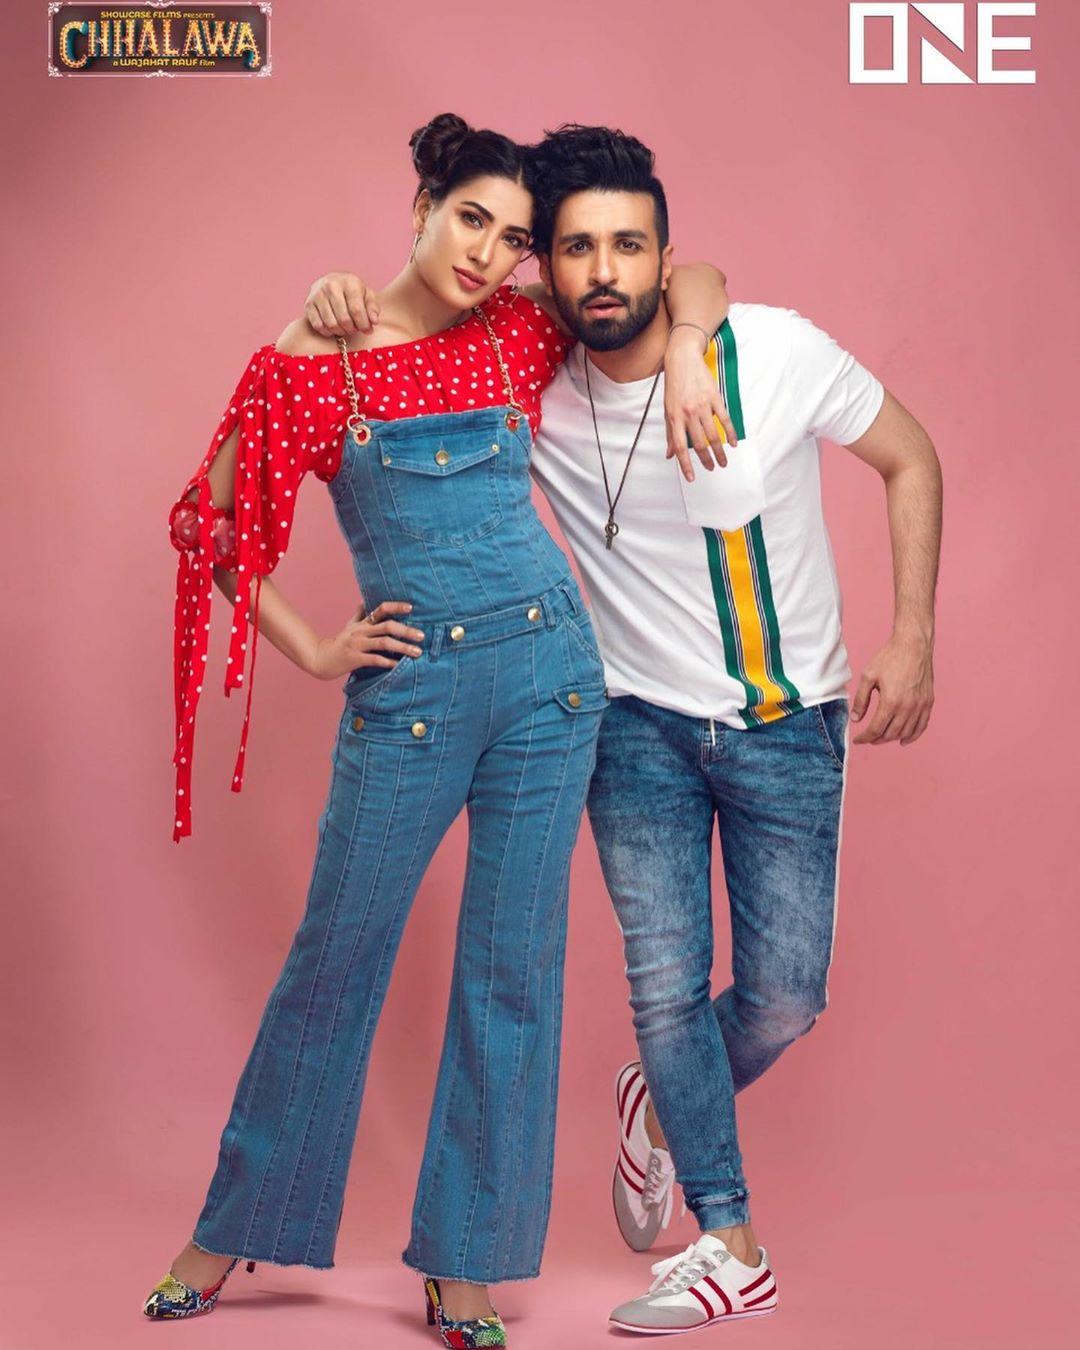 Mehwish Hayat & Azfar Rehman Photoshoot for a Clothing Brand